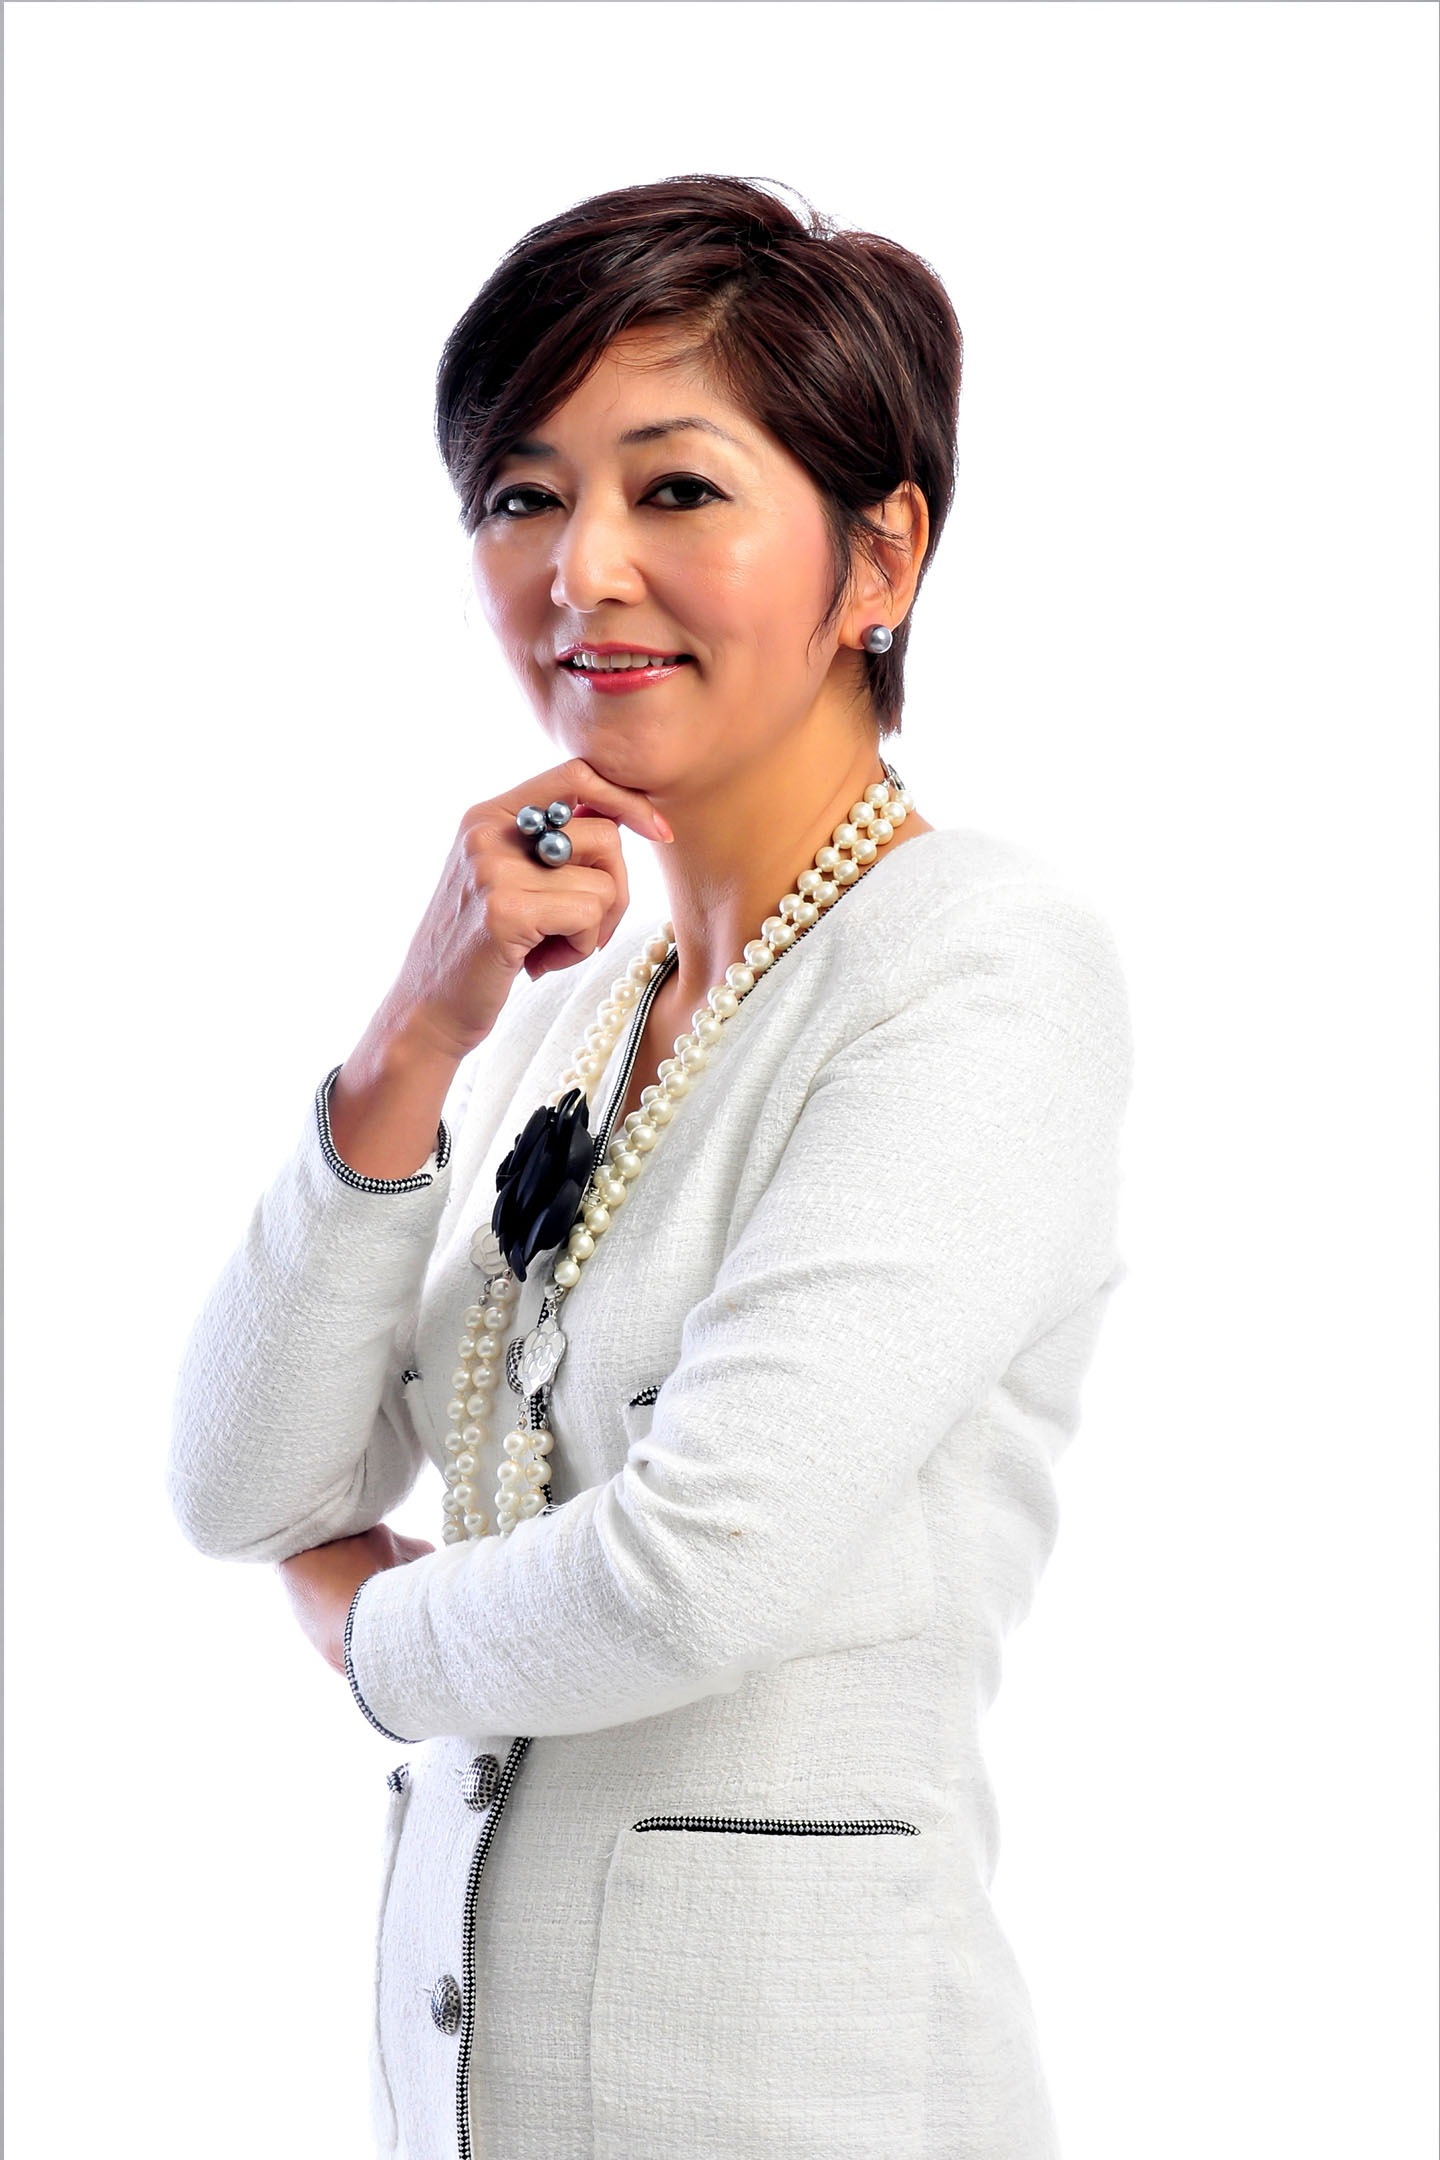 Testimonial from Image Consultant Josephine Lui